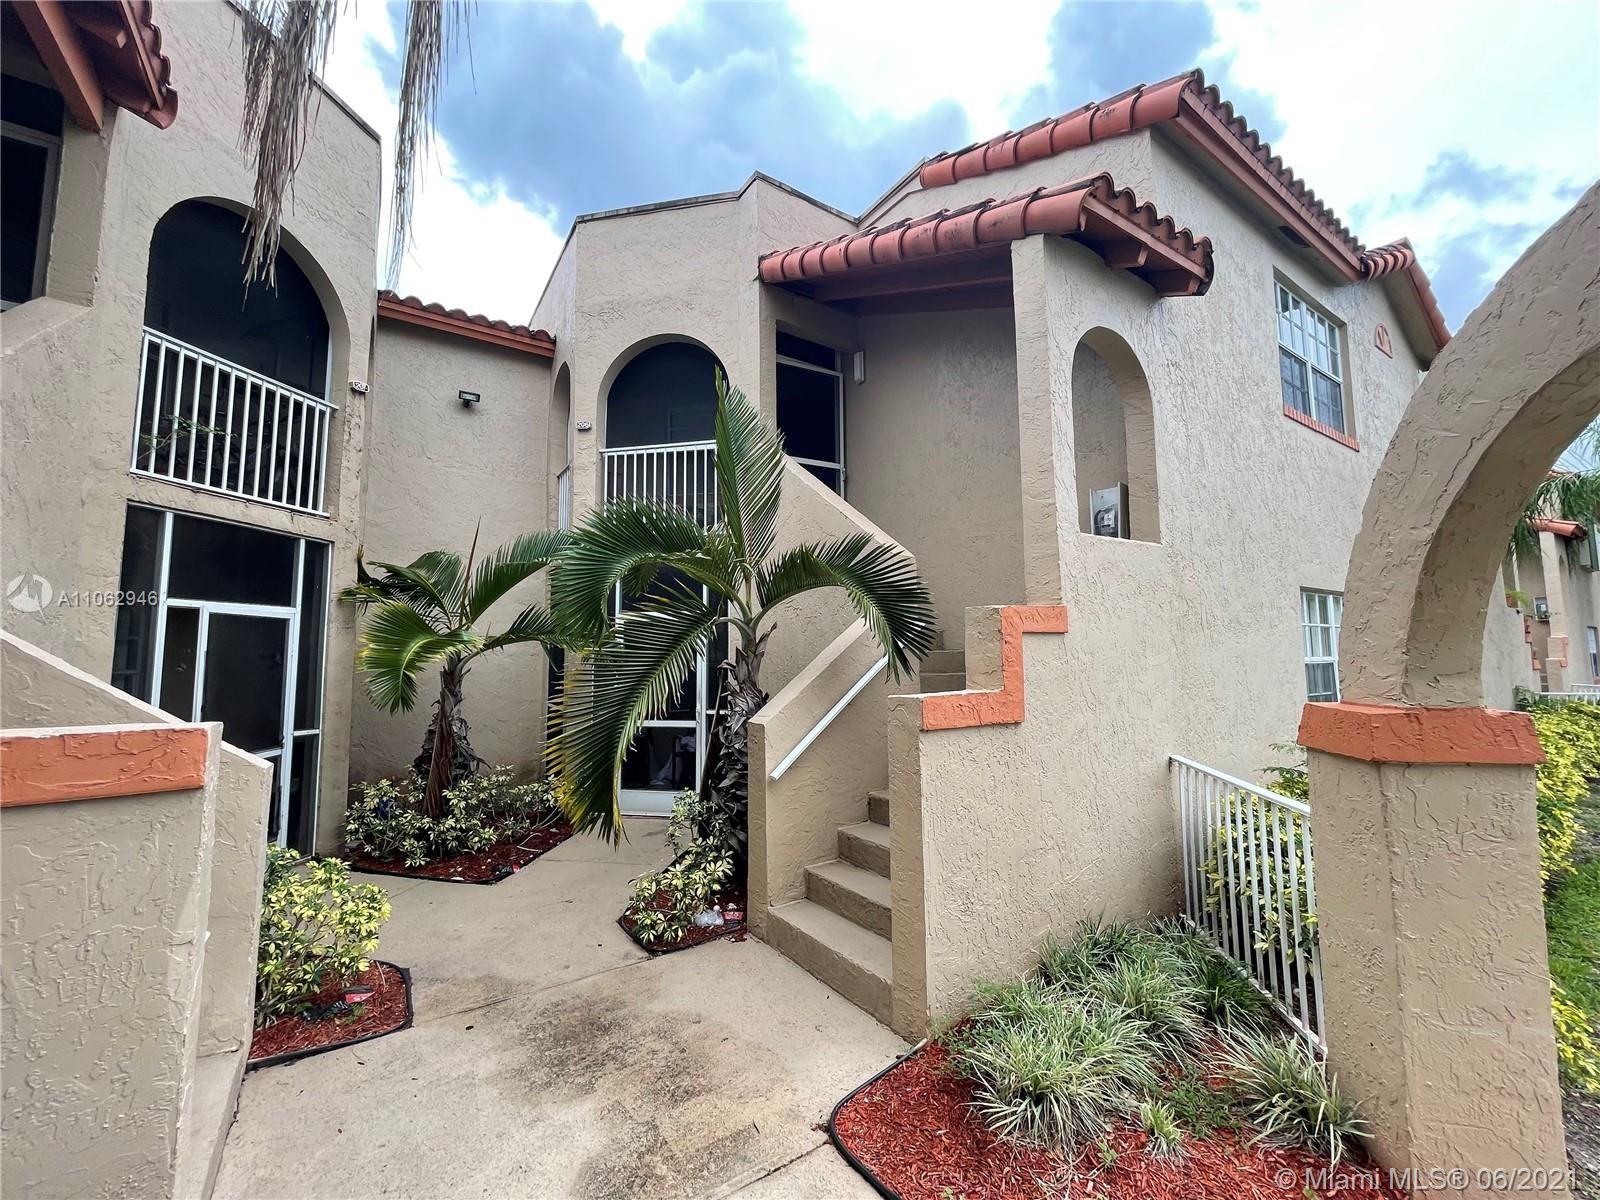 333 SW 86th Ave #206, Pembroke Pines, FL 33025 - #: A11062946